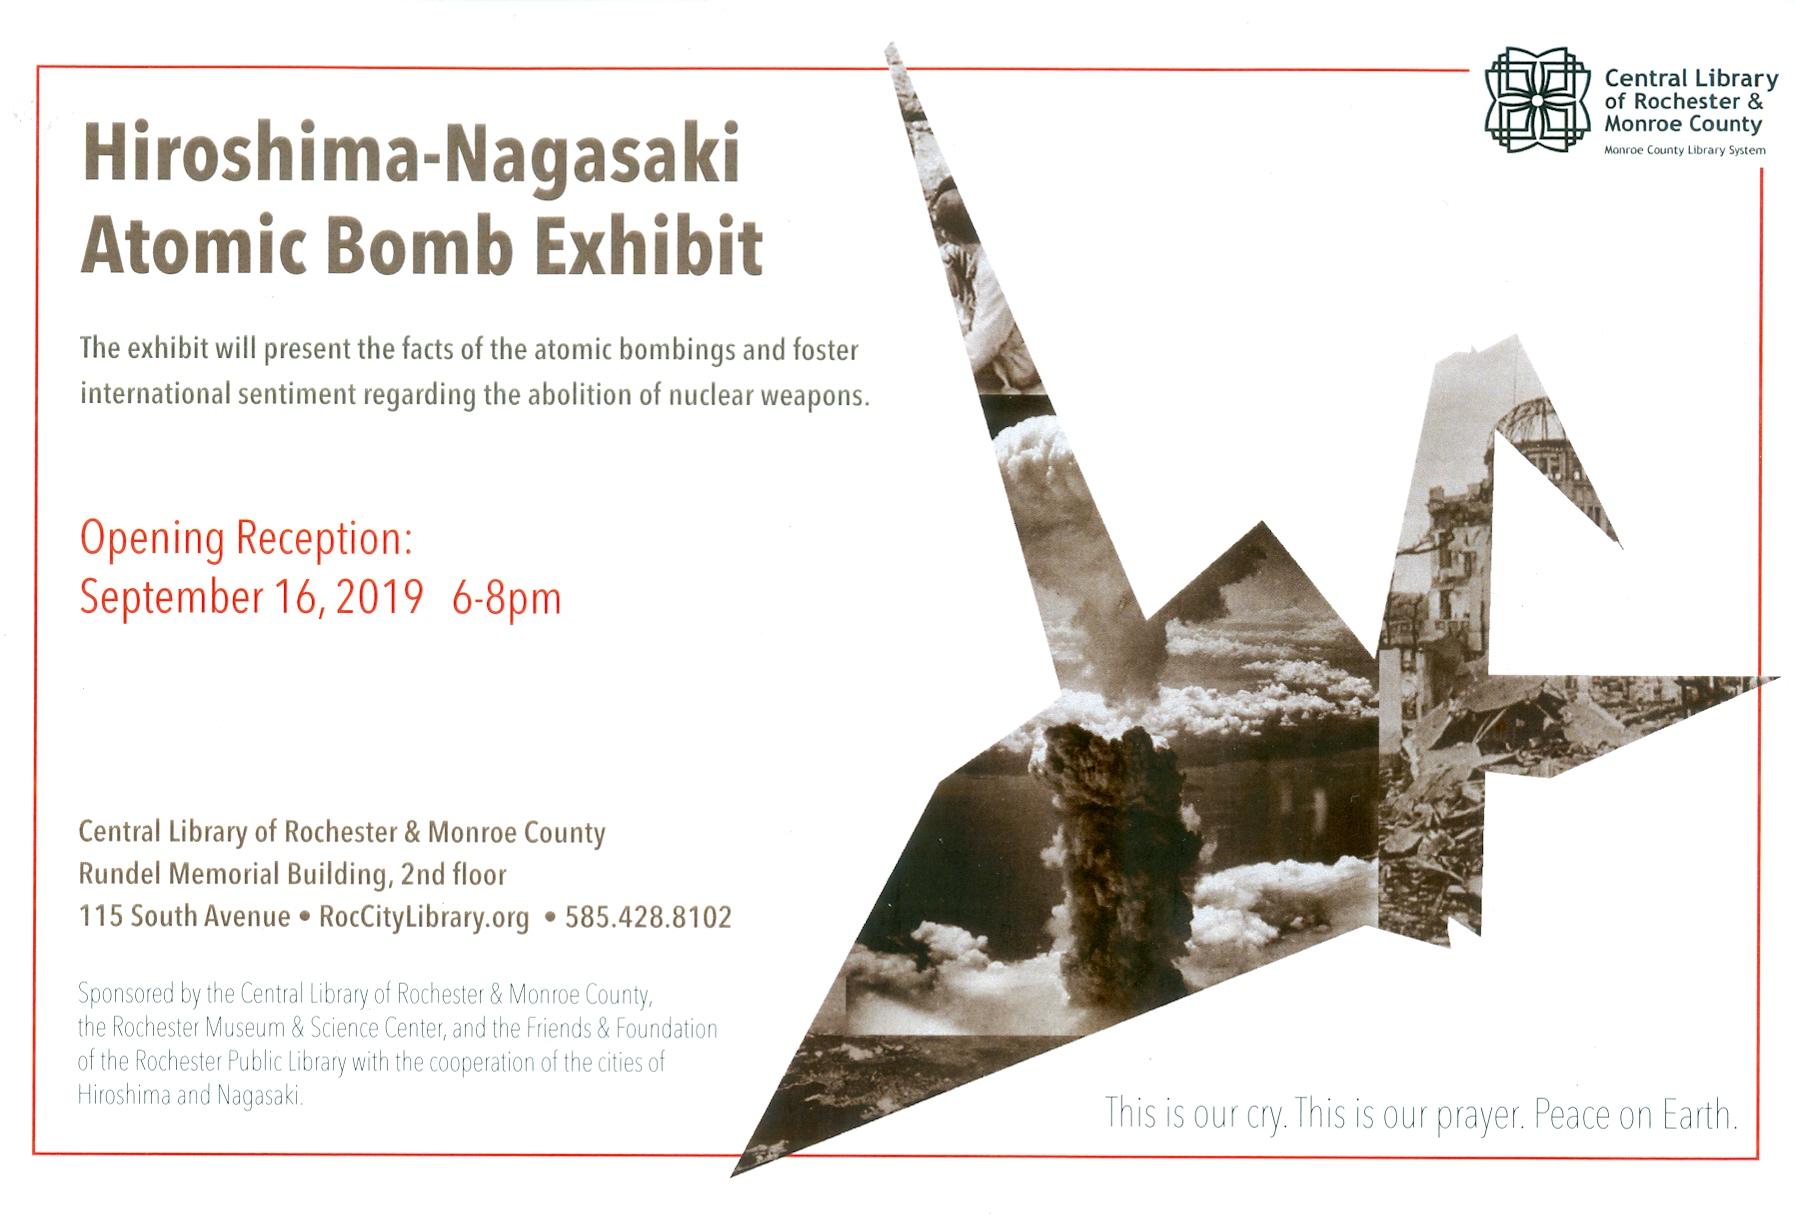 Opening Reception for the Hiroshima-Nagasaki Atomic Bomb Exhibit